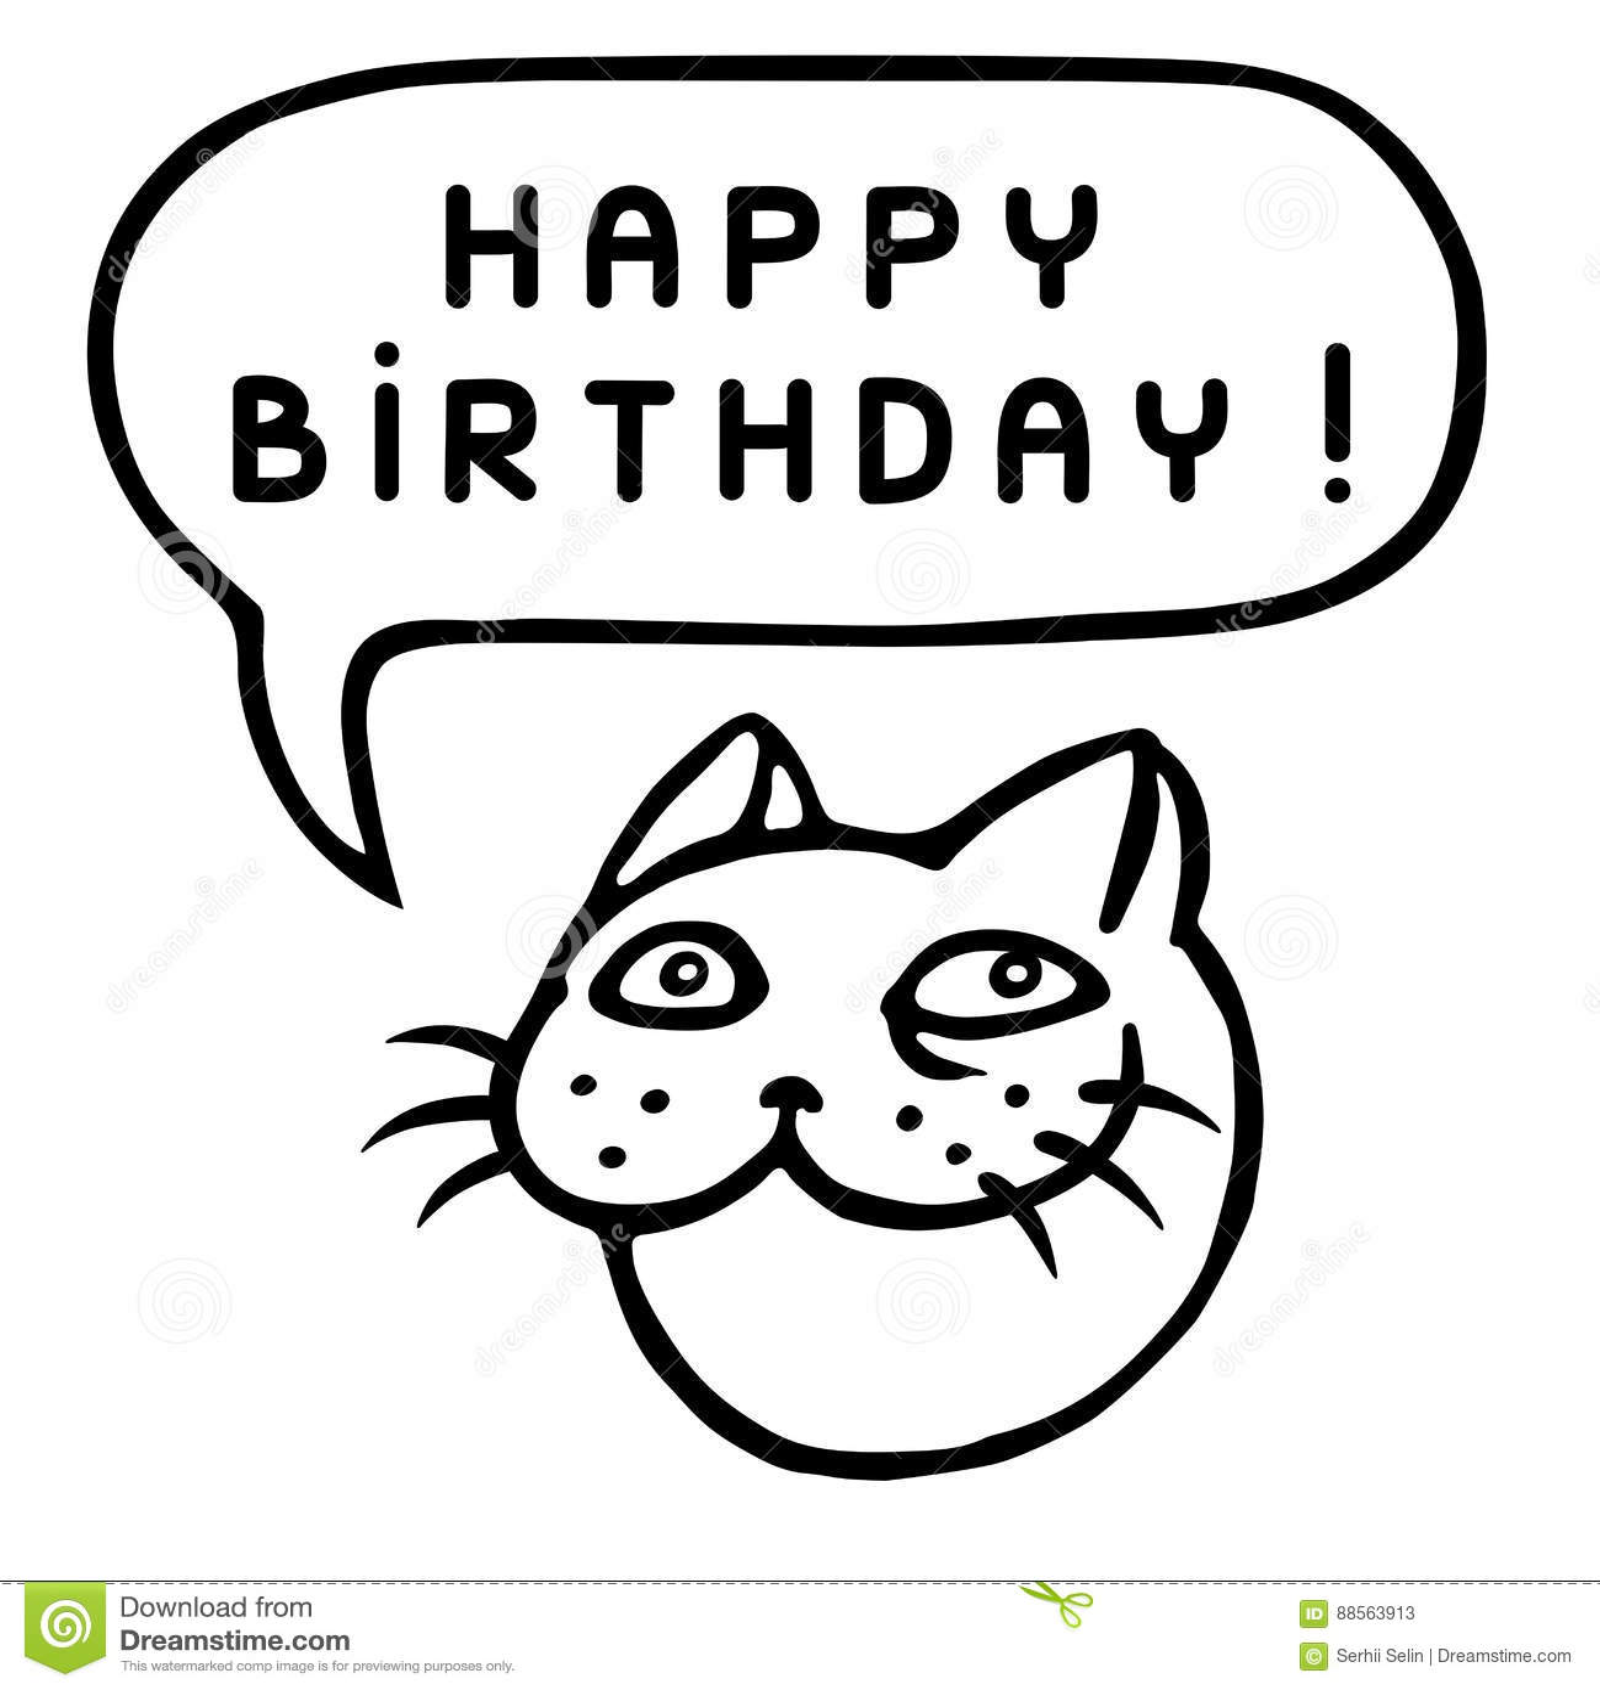 Happy Birthday Cartoon Cat Head Speech Bubble Vector Illustration